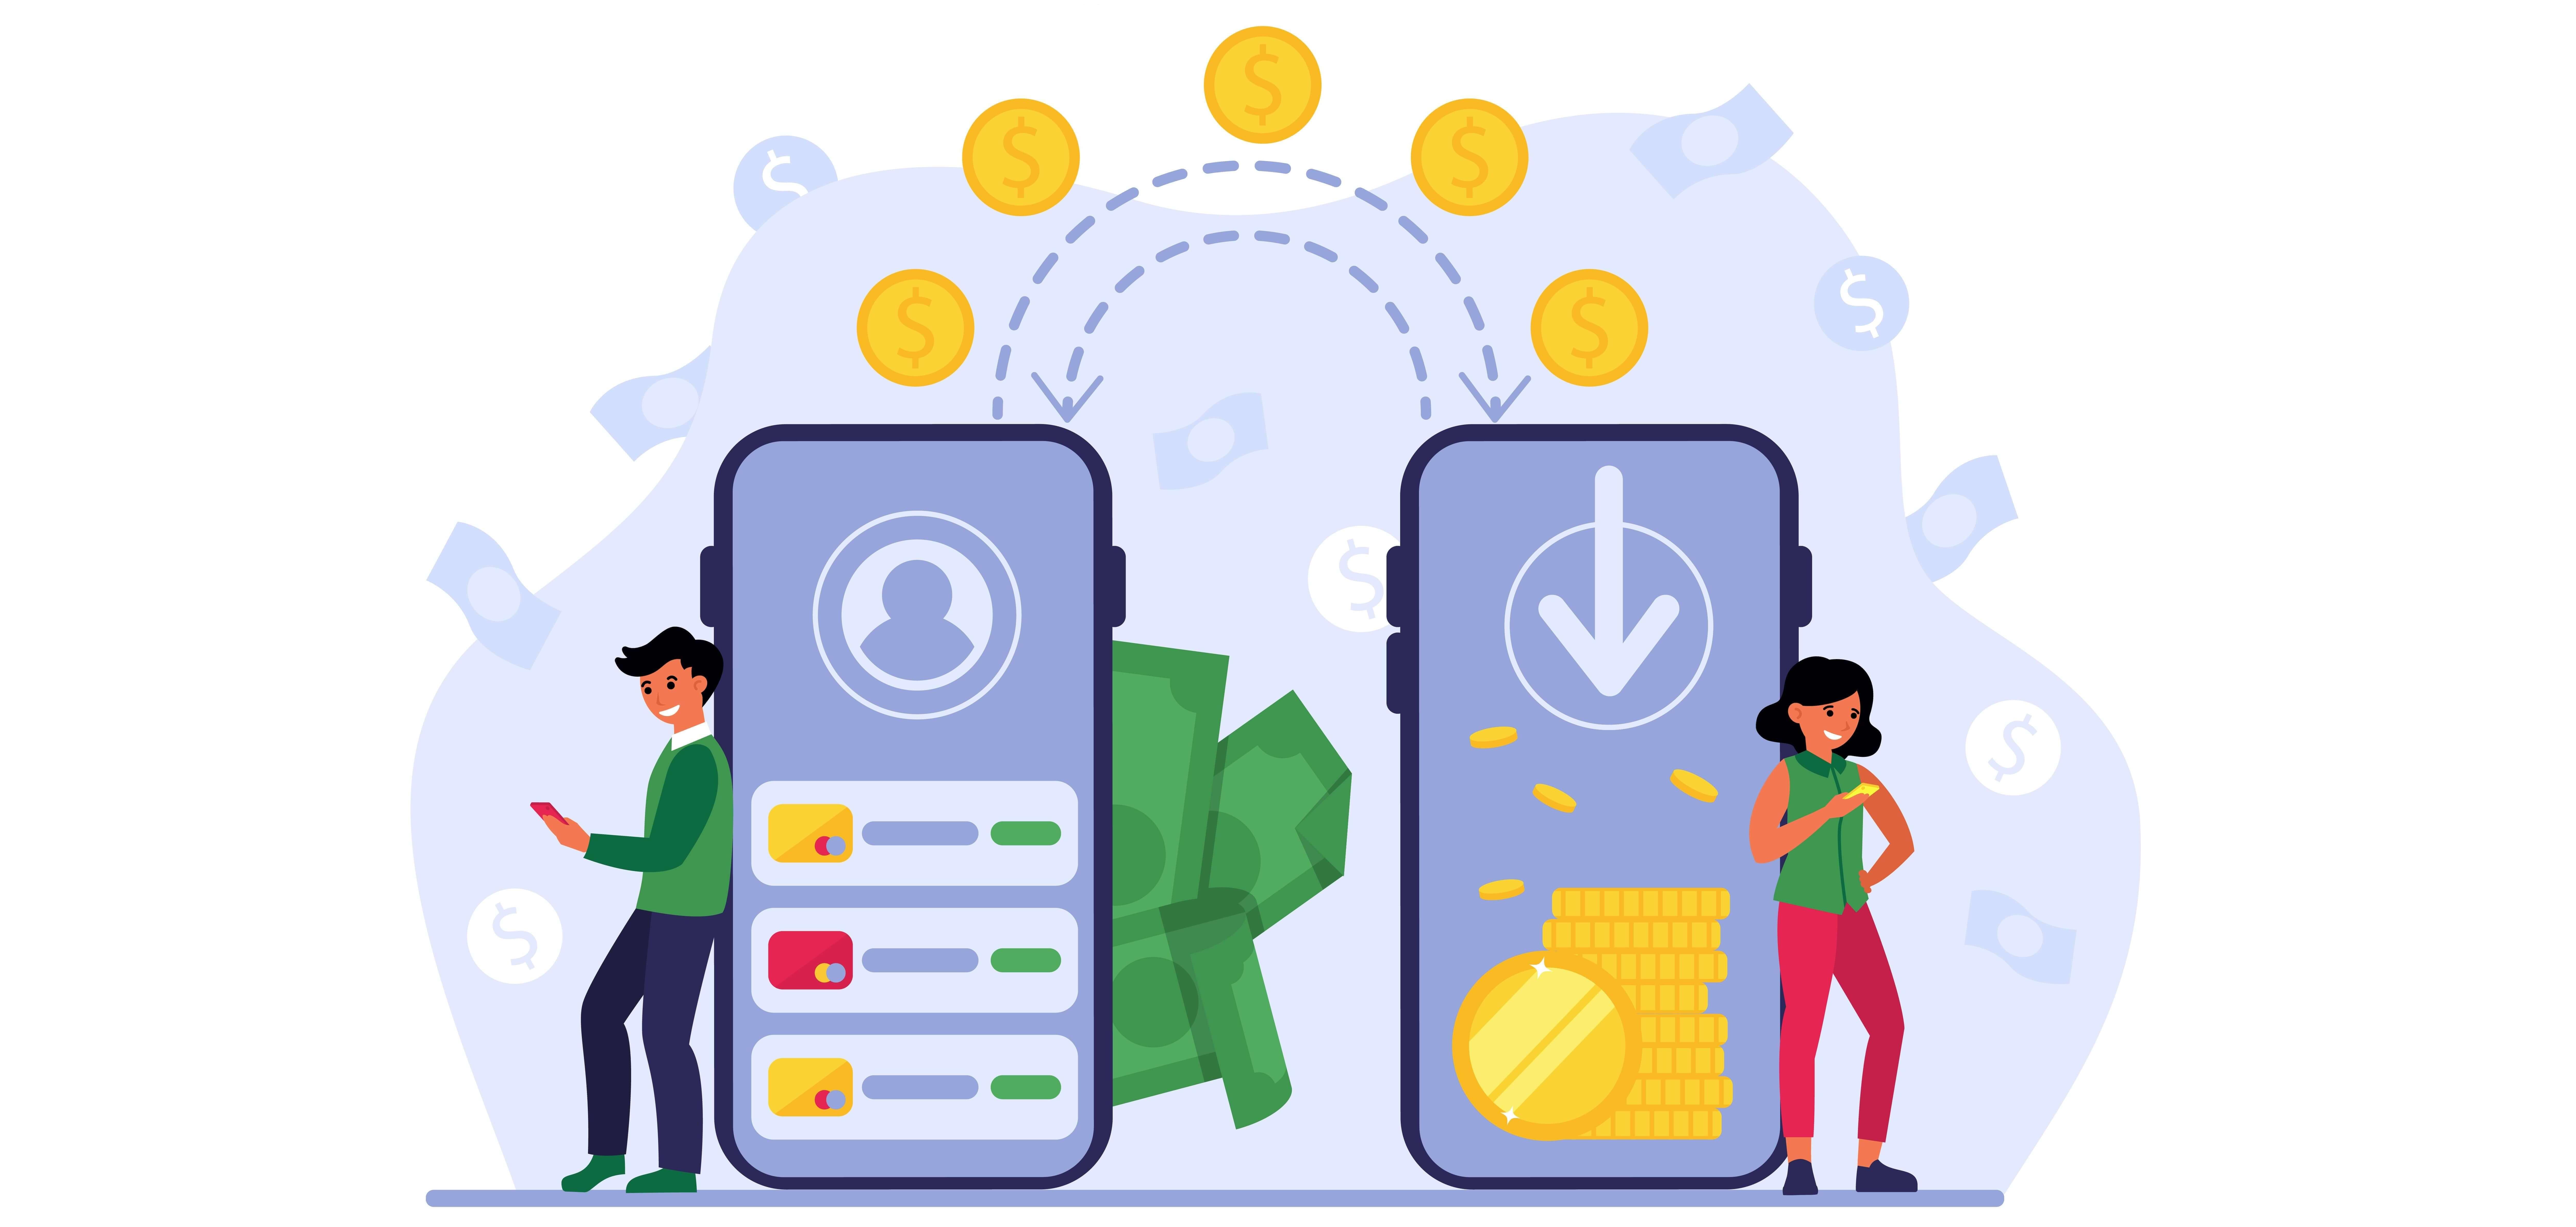 How to Deposit Money in Pocket Option